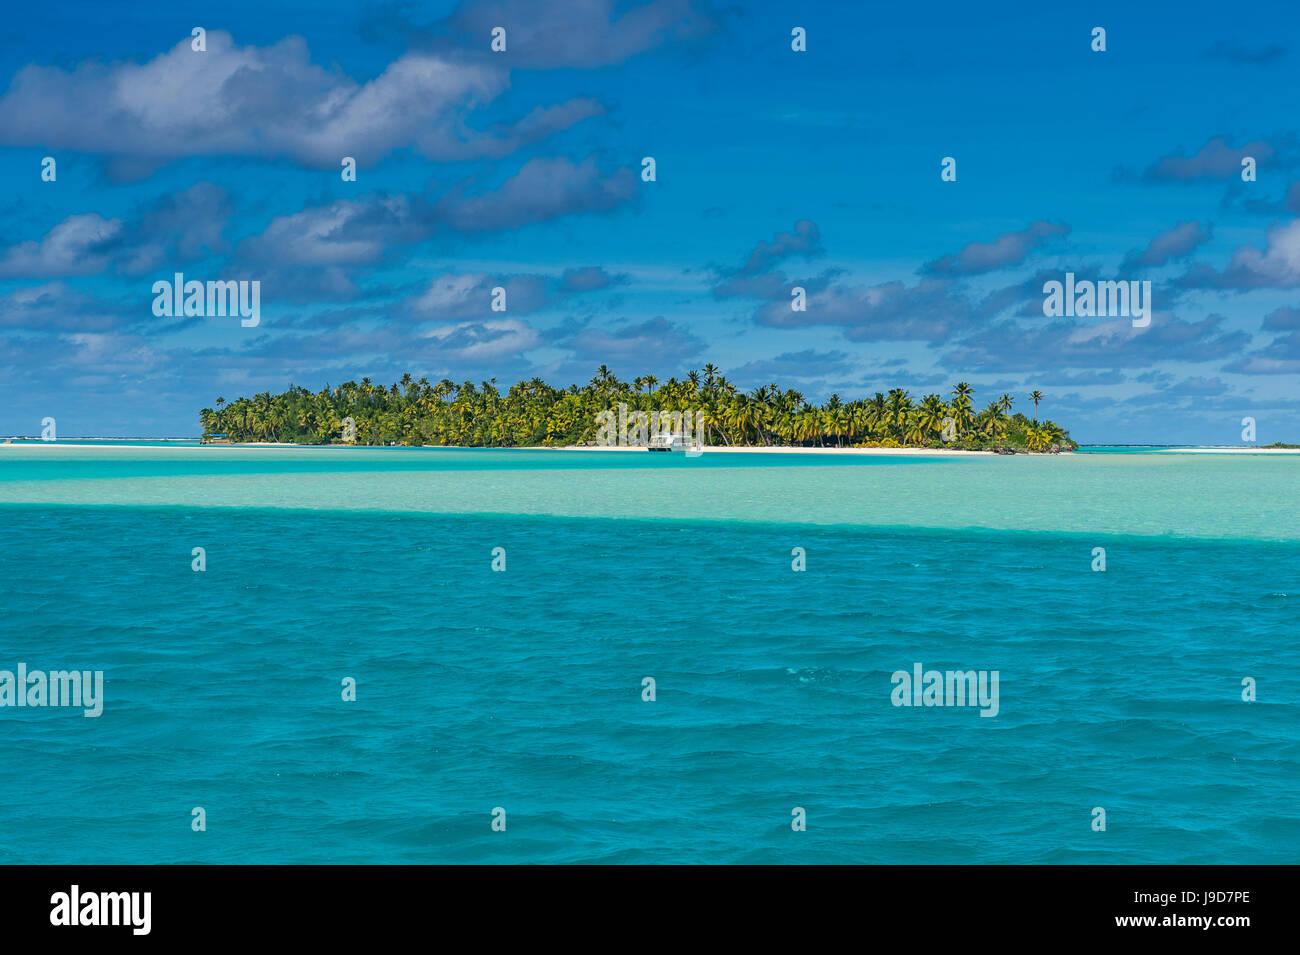 Aitutaki lagoon, Rarotonga and the Cook Islands, South Pacific, Pacific - Stock Image